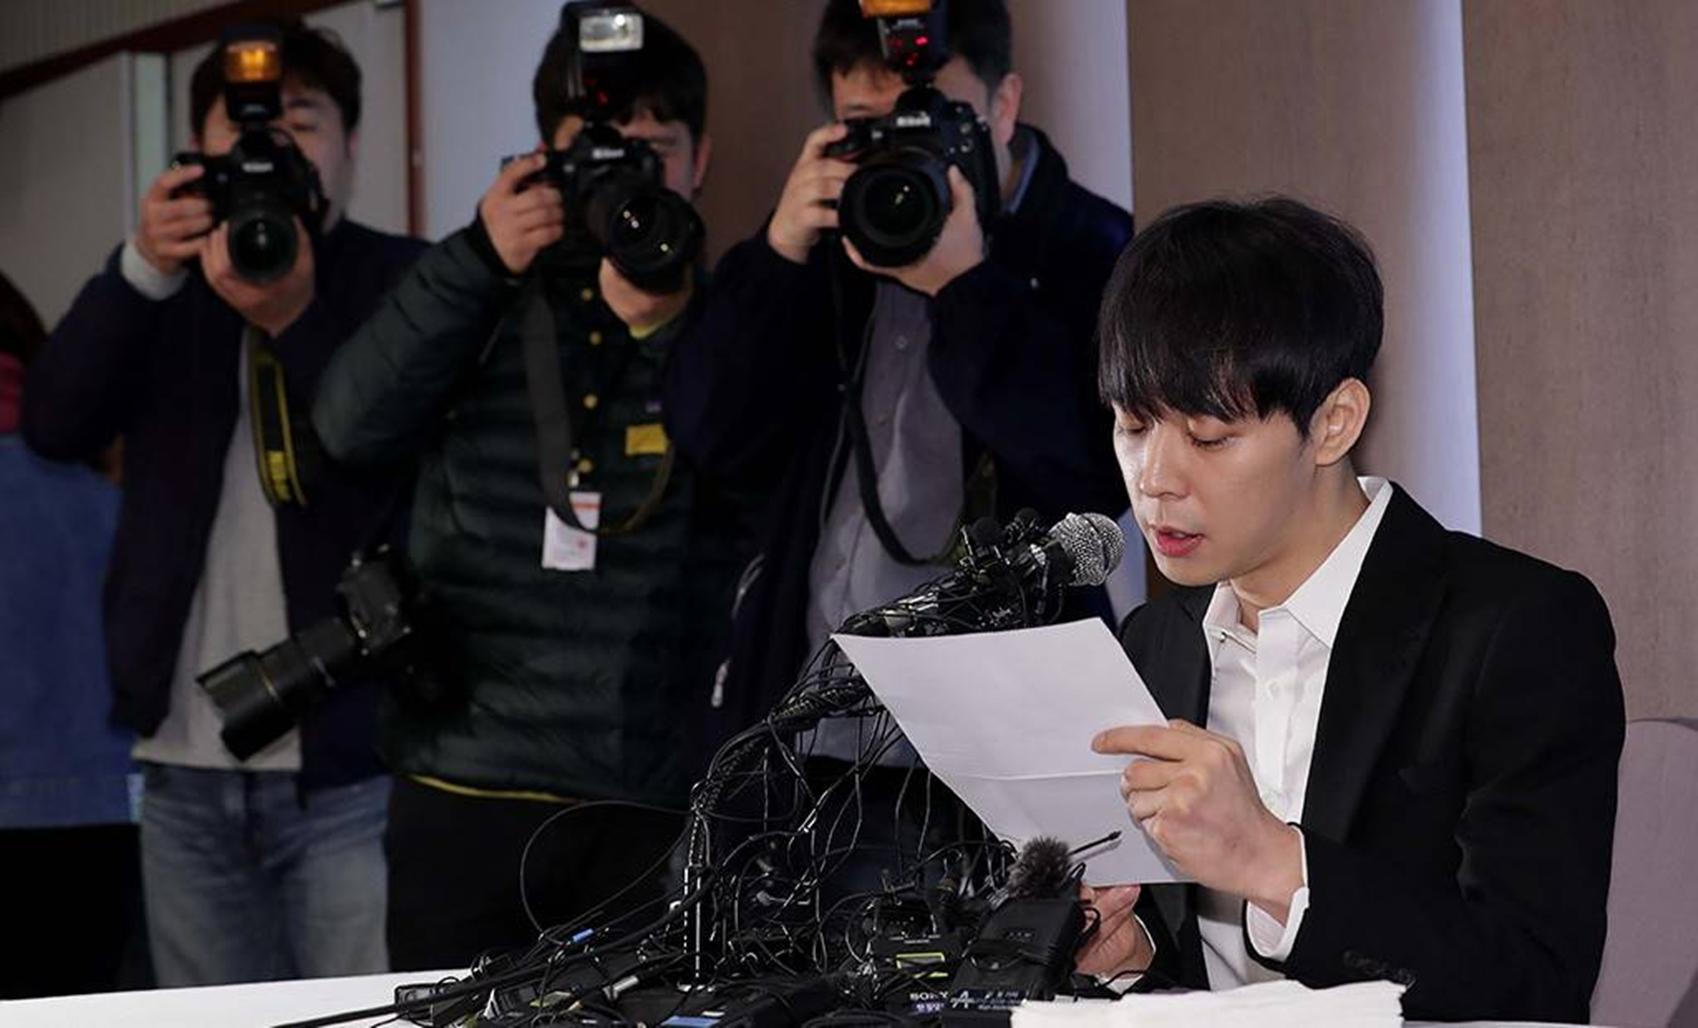 Telah Ditetapkan Tanggal Sidang Pertama Park Yoo Chun Mengenai Kasus Narkoba 3